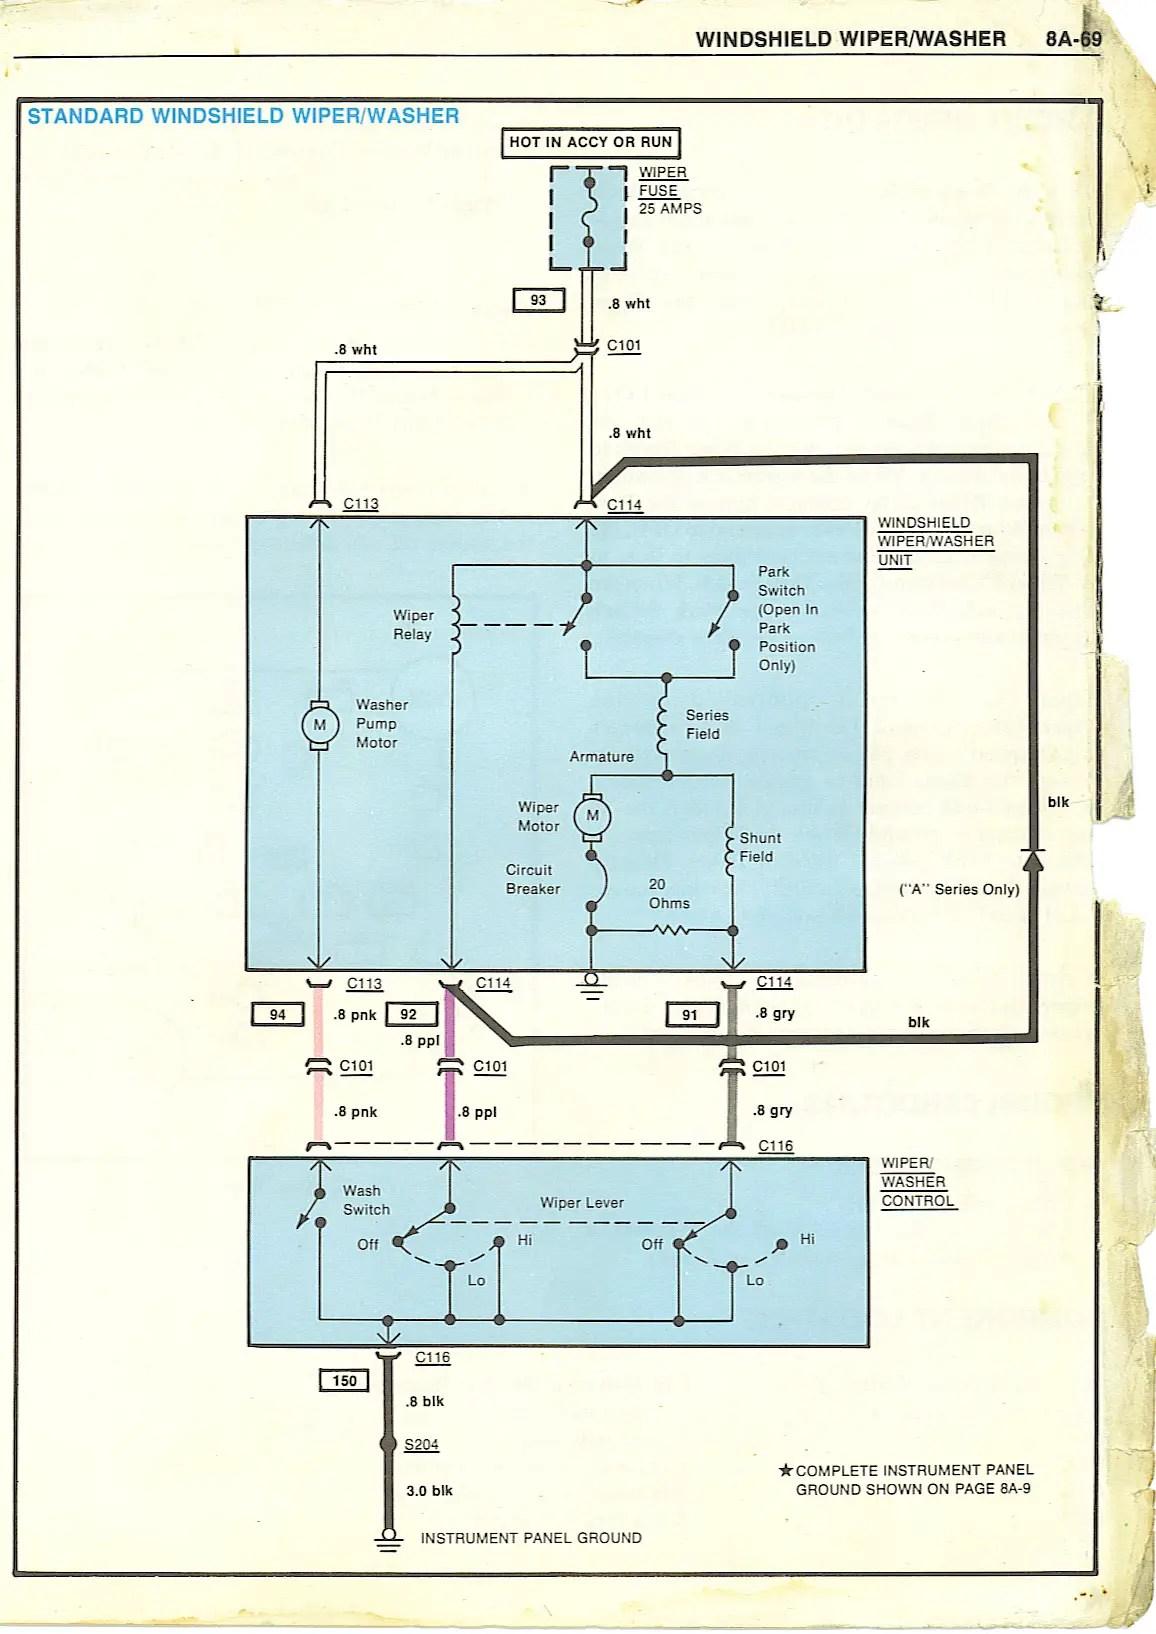 hight resolution of solved installed an 86 el camino steering fixyamaliburacing com wiring diagrams standardwiperwasher jpg